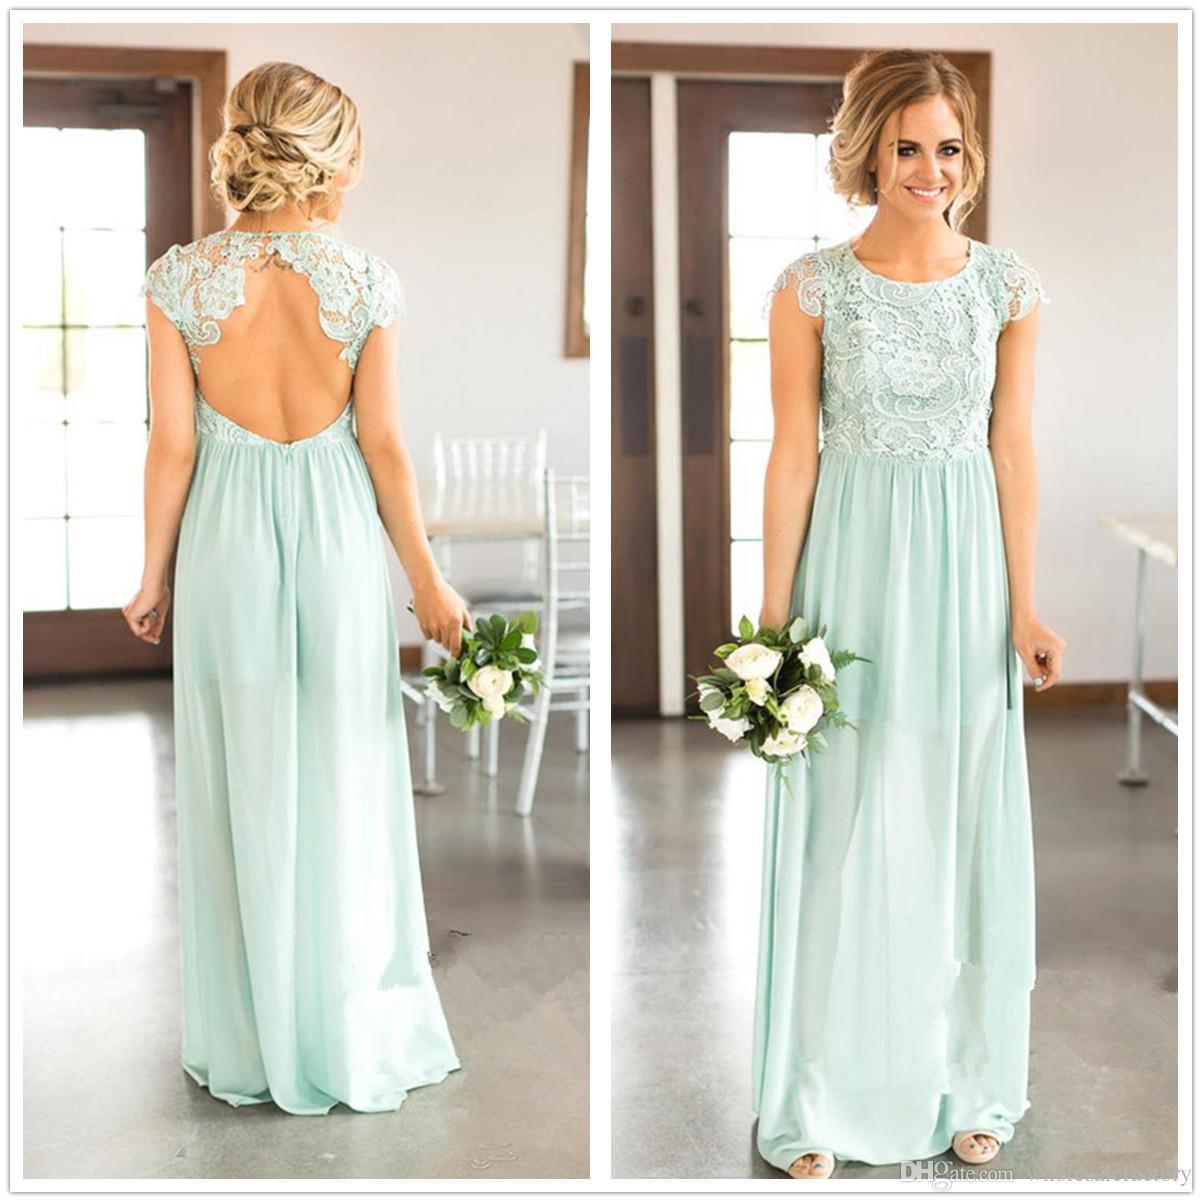 13 Elegant Kleid Lang Mint Boutique15 Genial Kleid Lang Mint Spezialgebiet